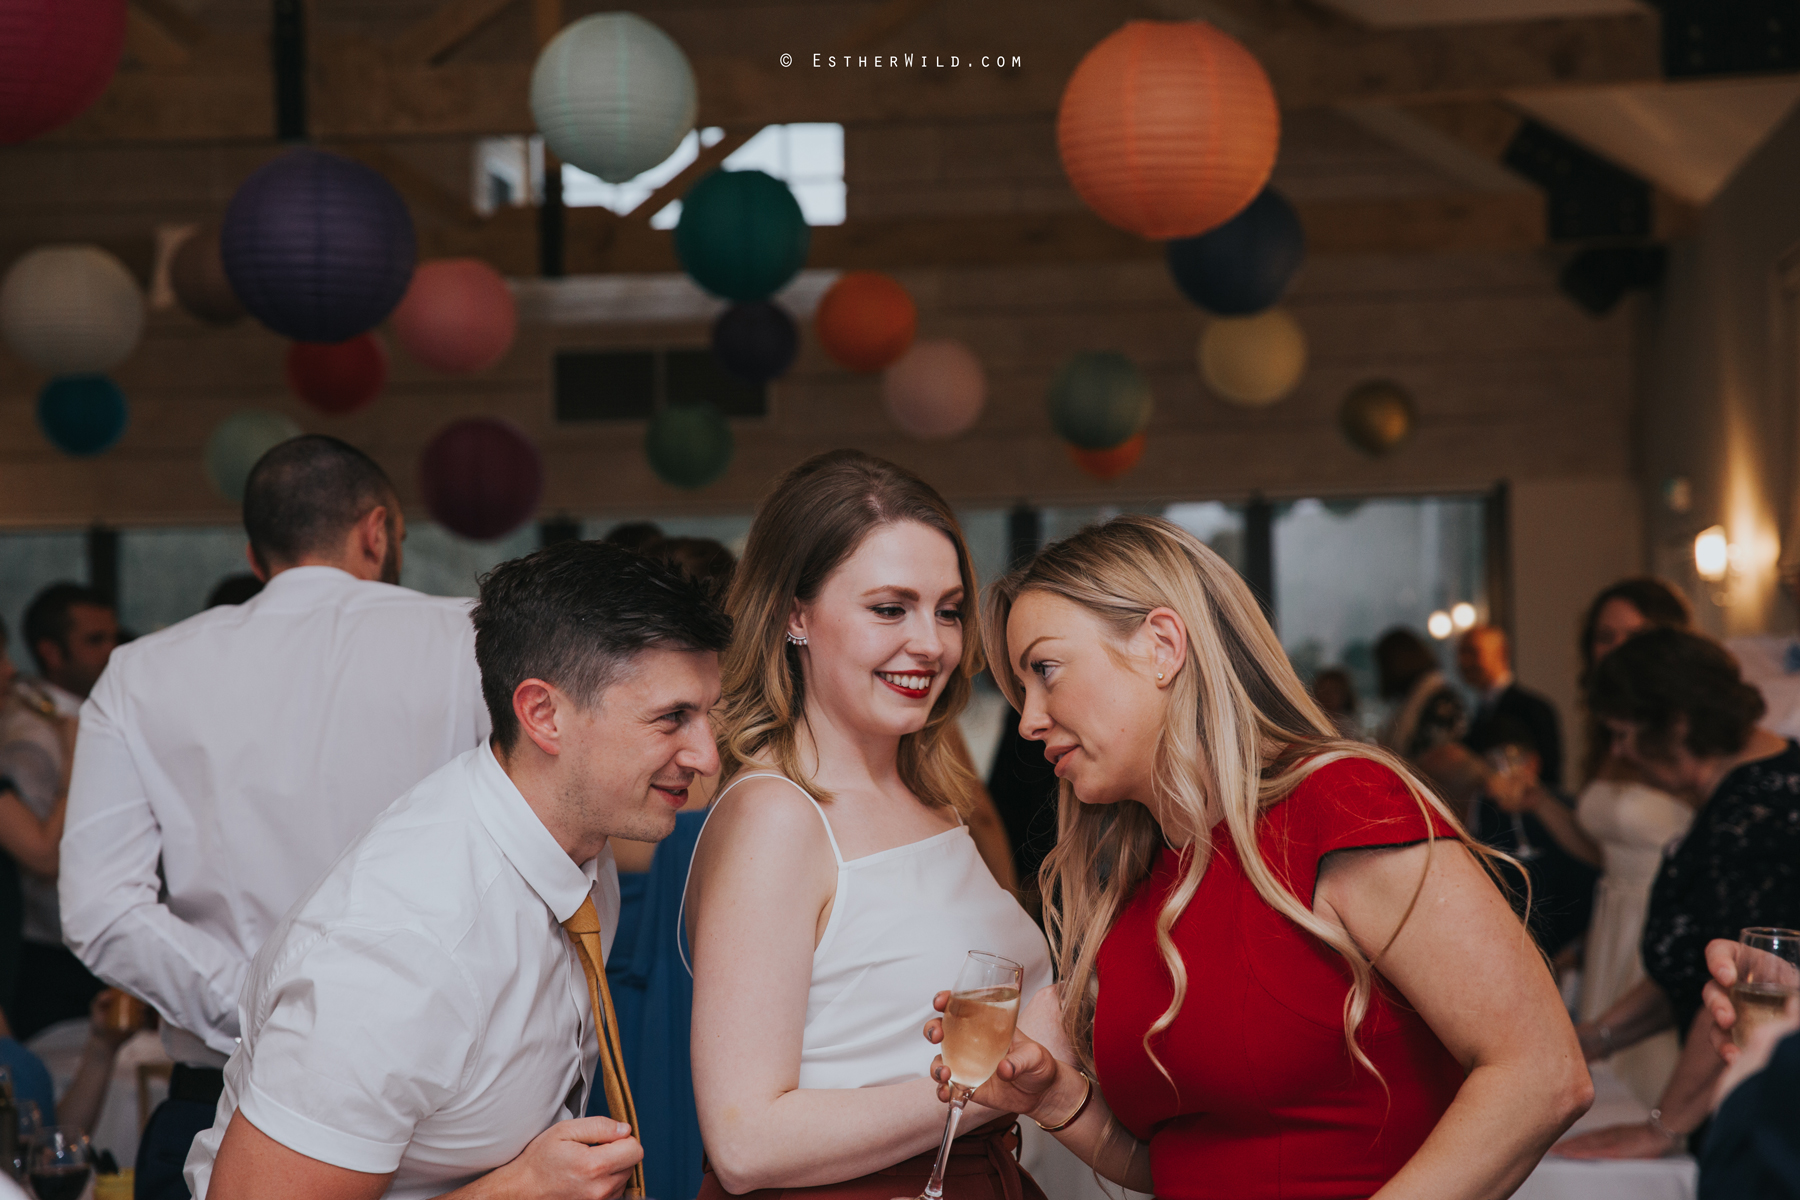 The_BoatHouse_Wedding_Venue_Ormesby_Norfolk_Broads_Boat_Wedding_Photography_Esther_Wild_Photographer_IMG_3106.jpg